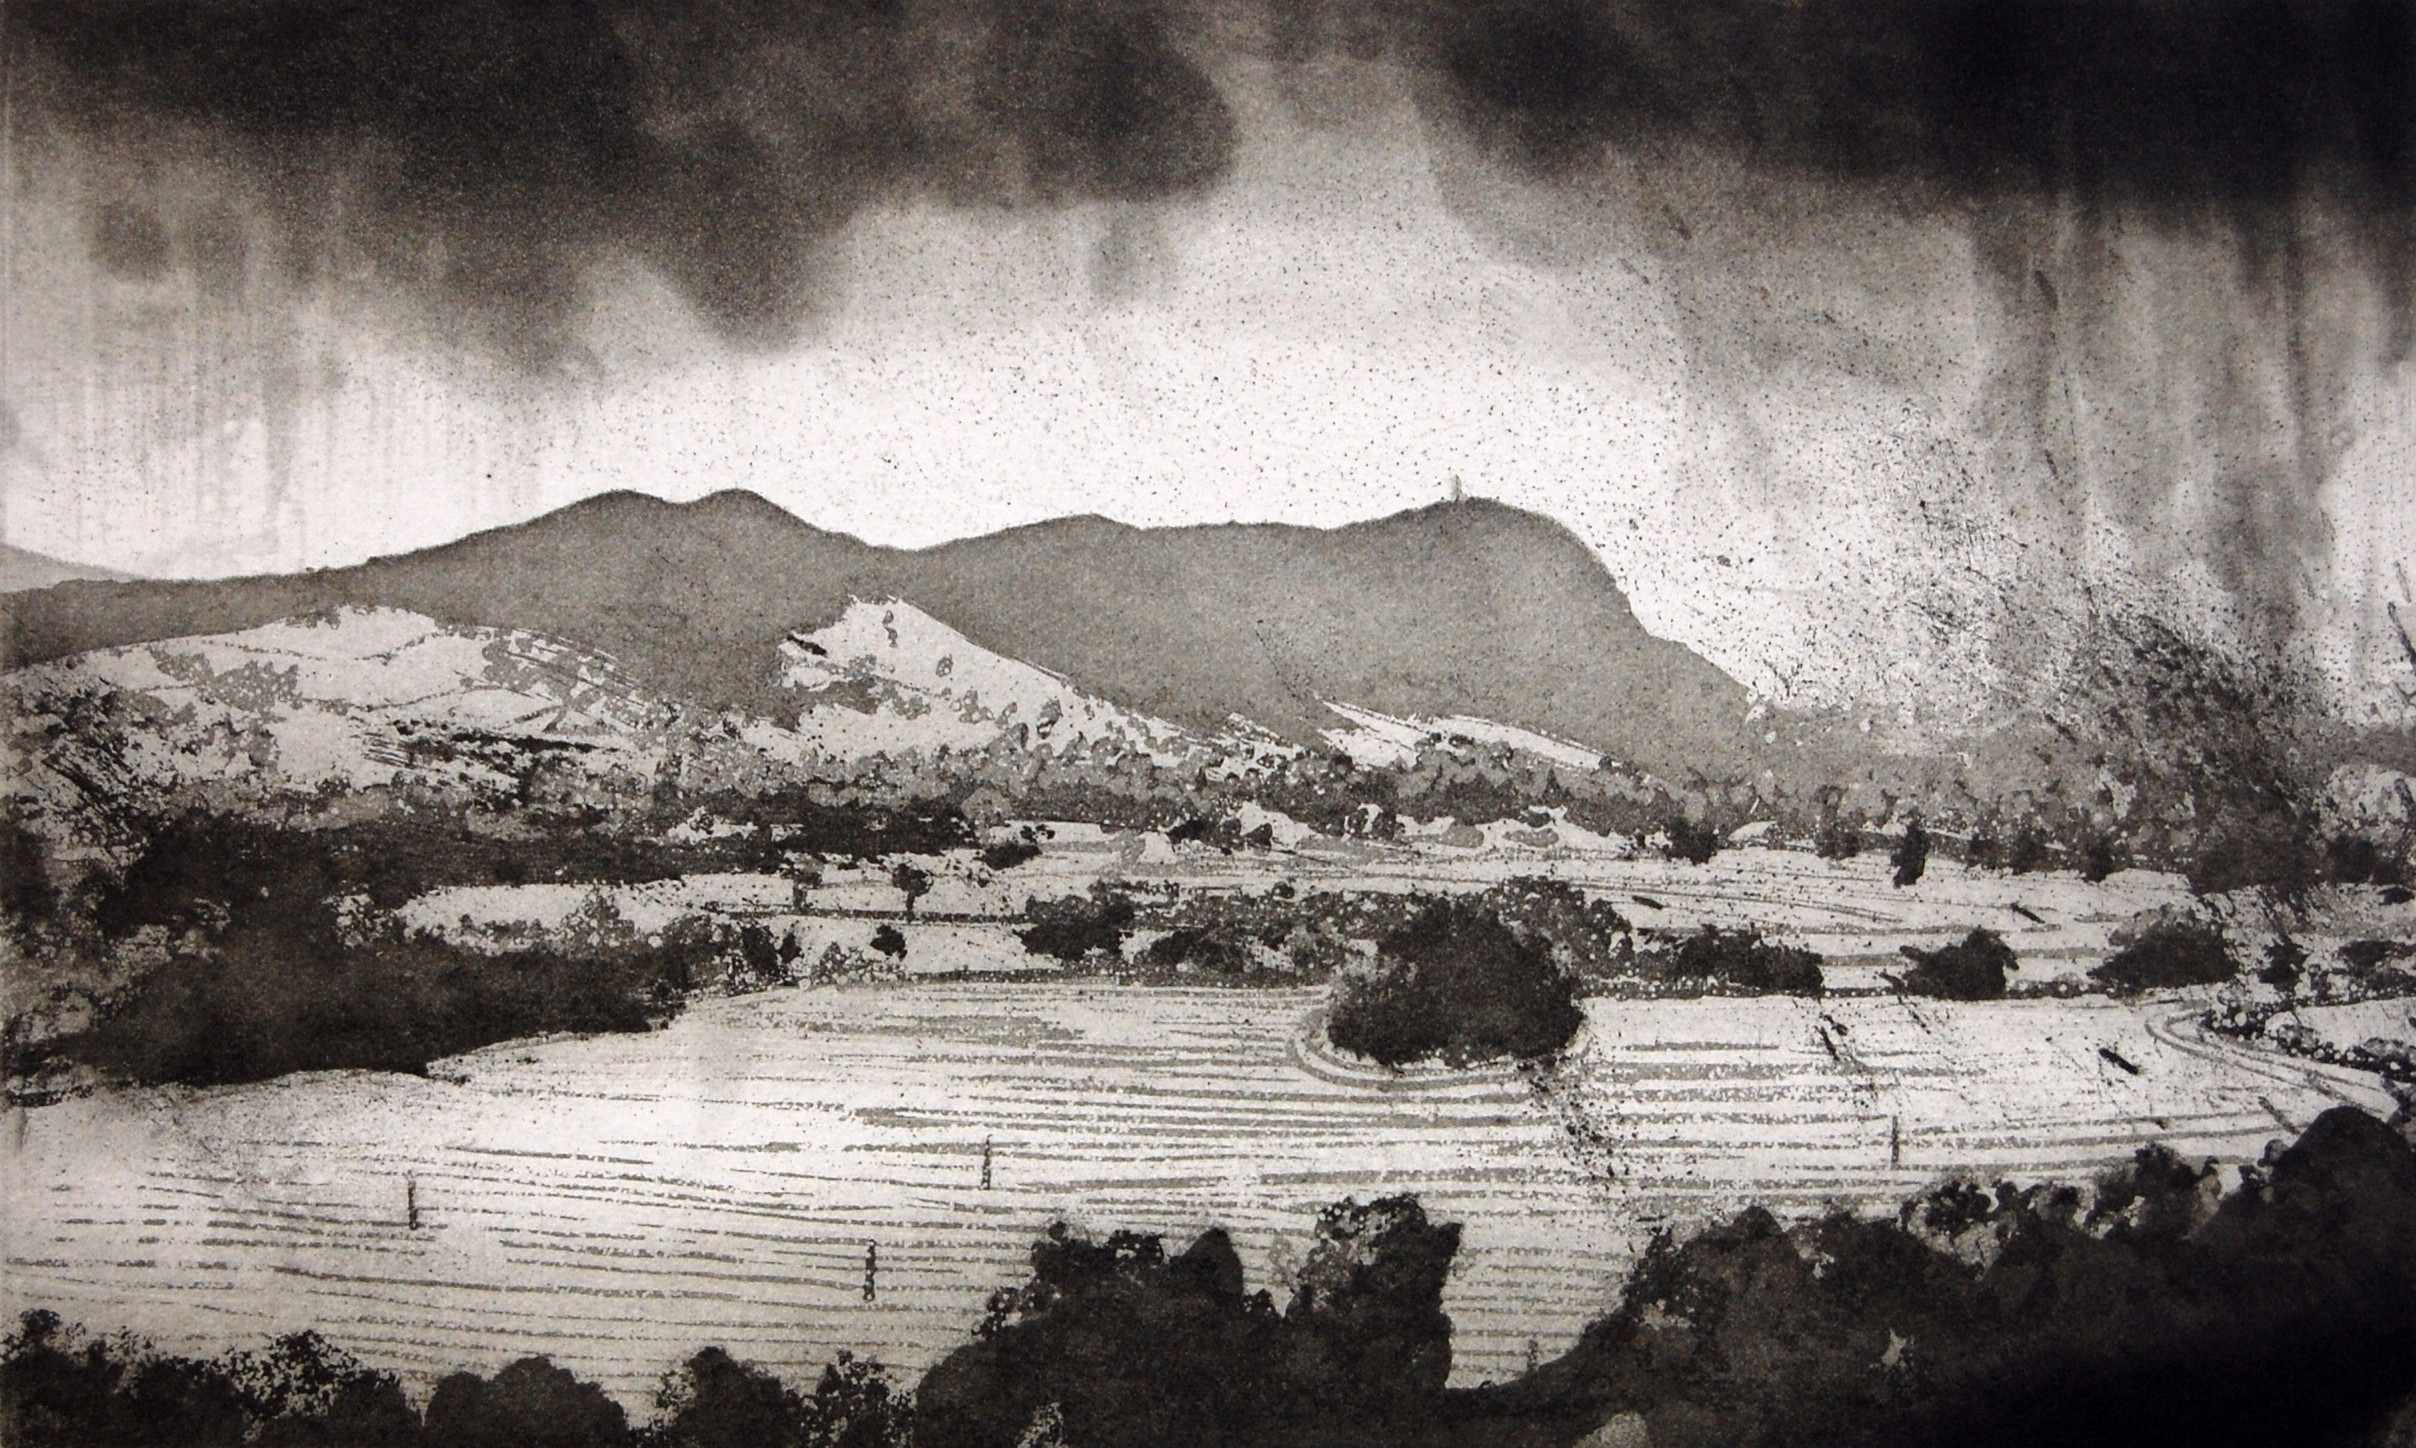 Breidden Hill